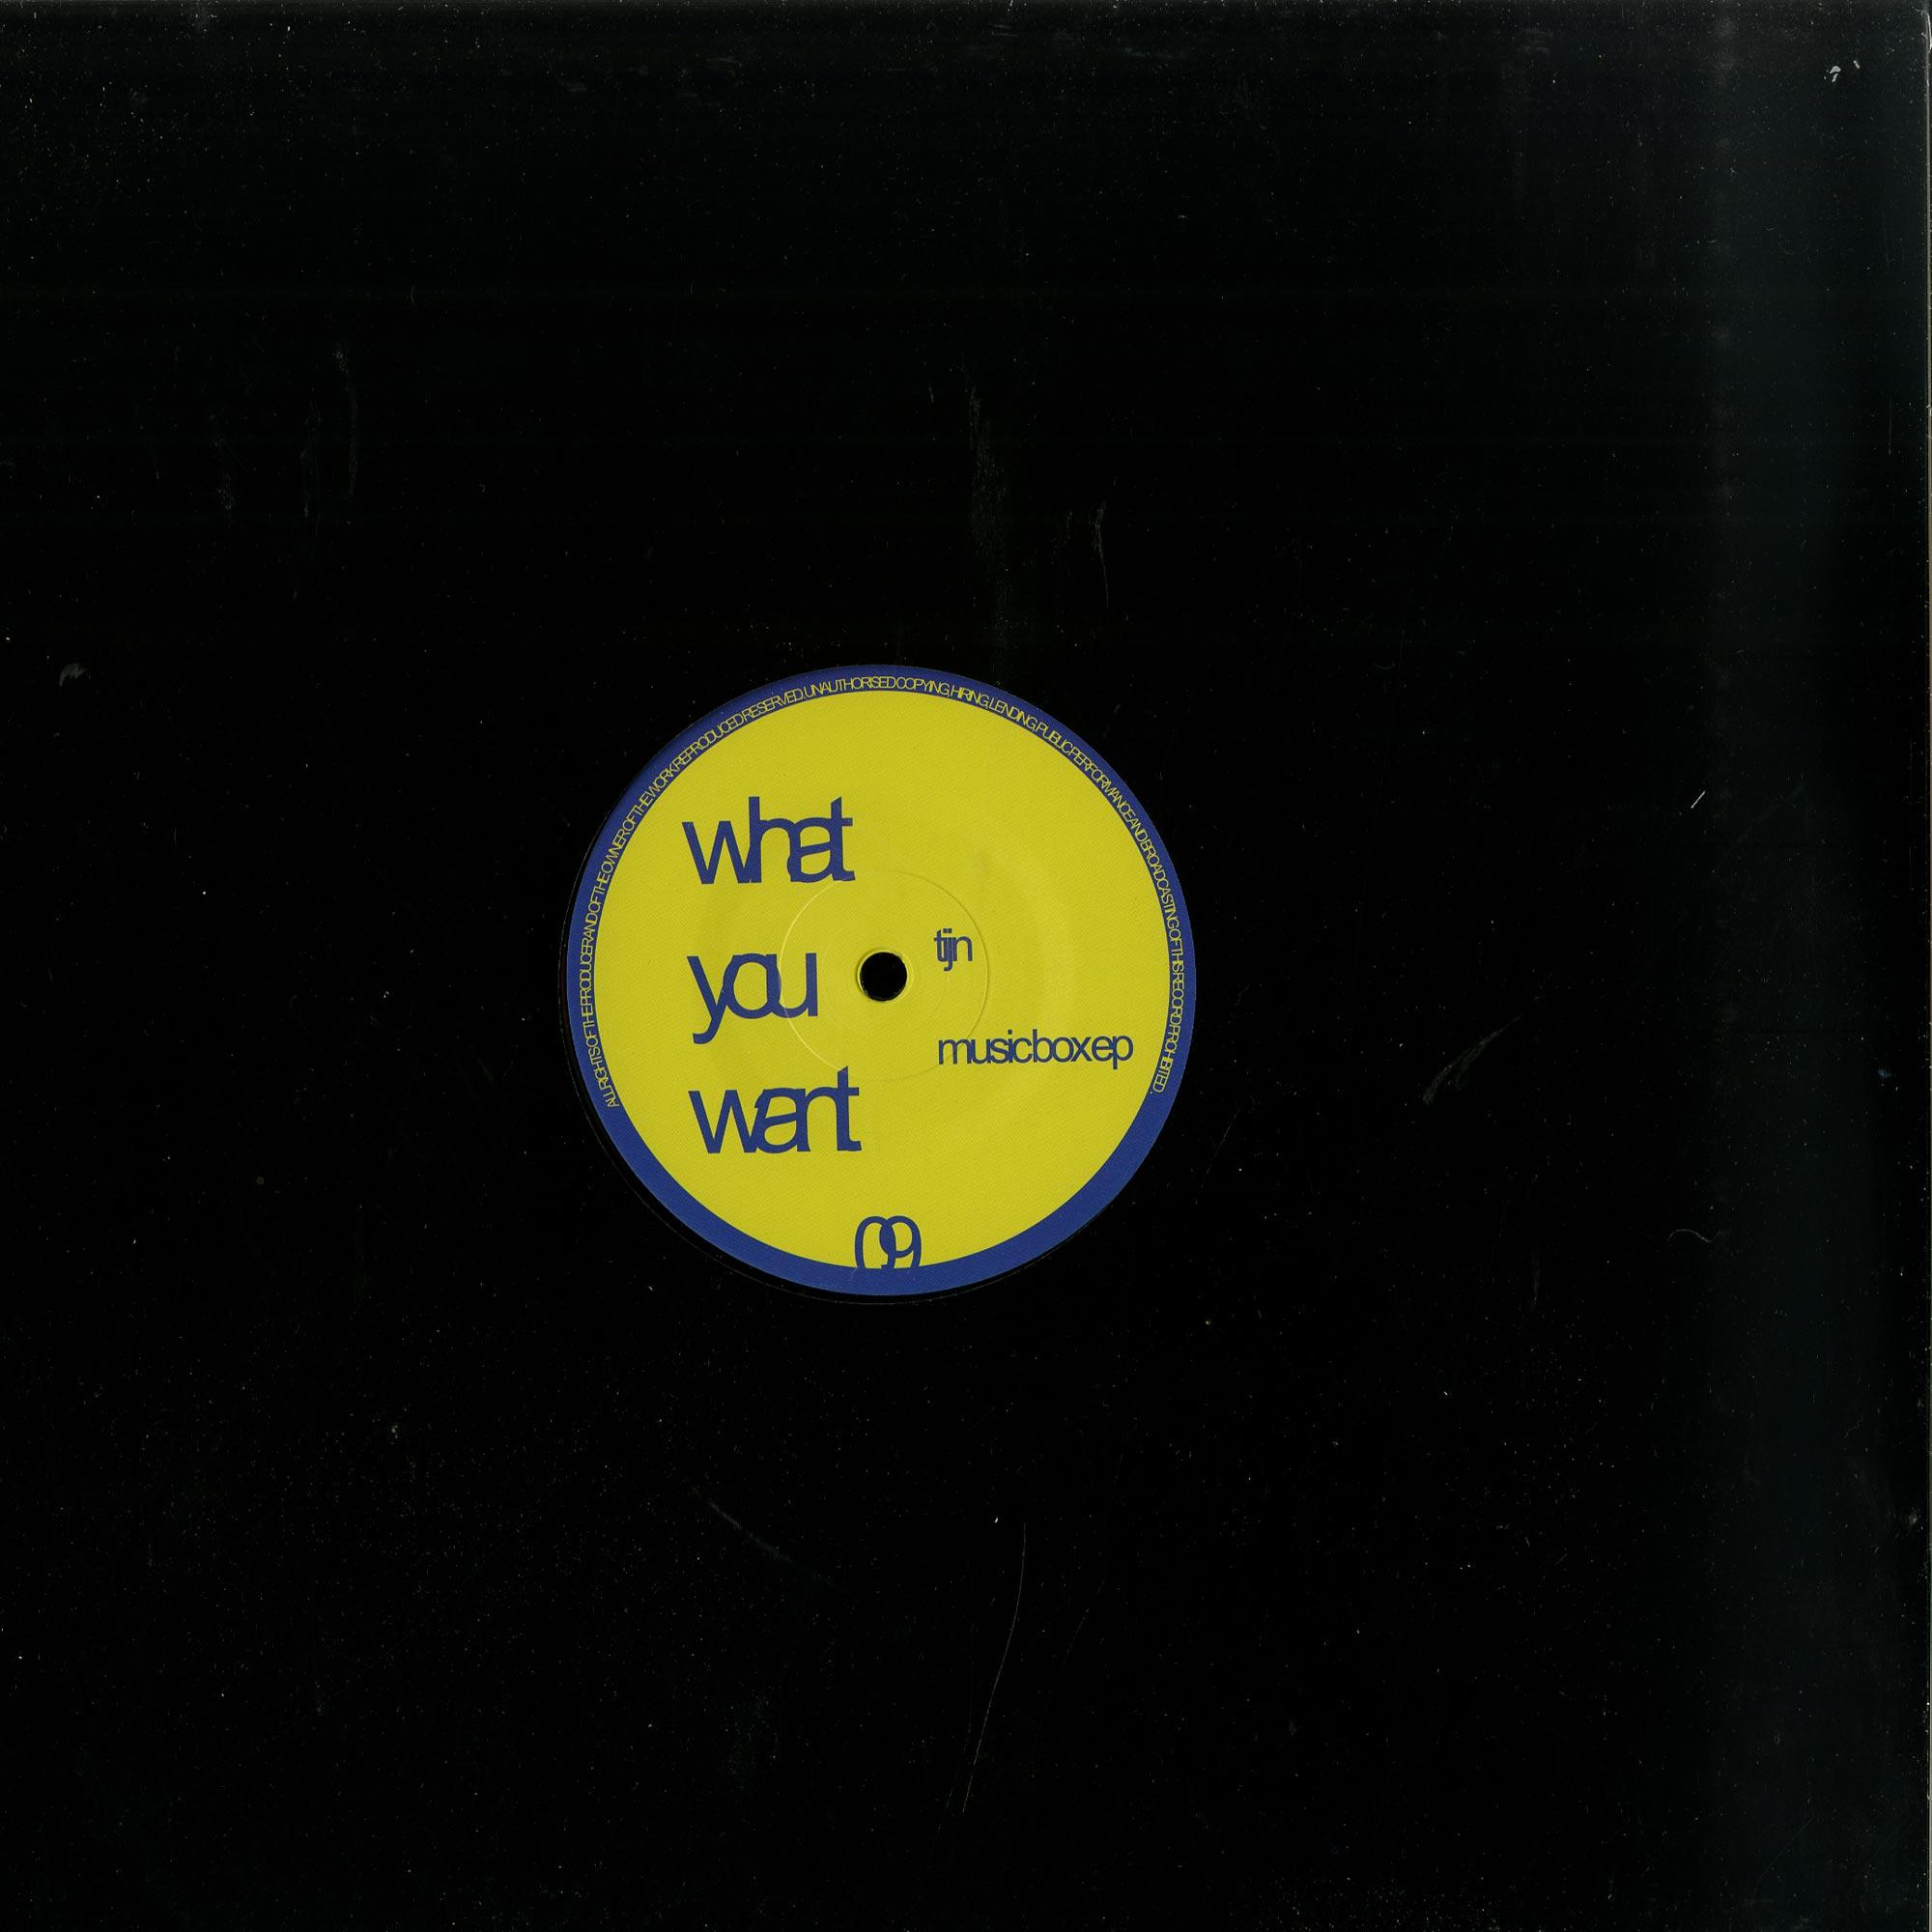 Tijn - MUSIC BOX EP